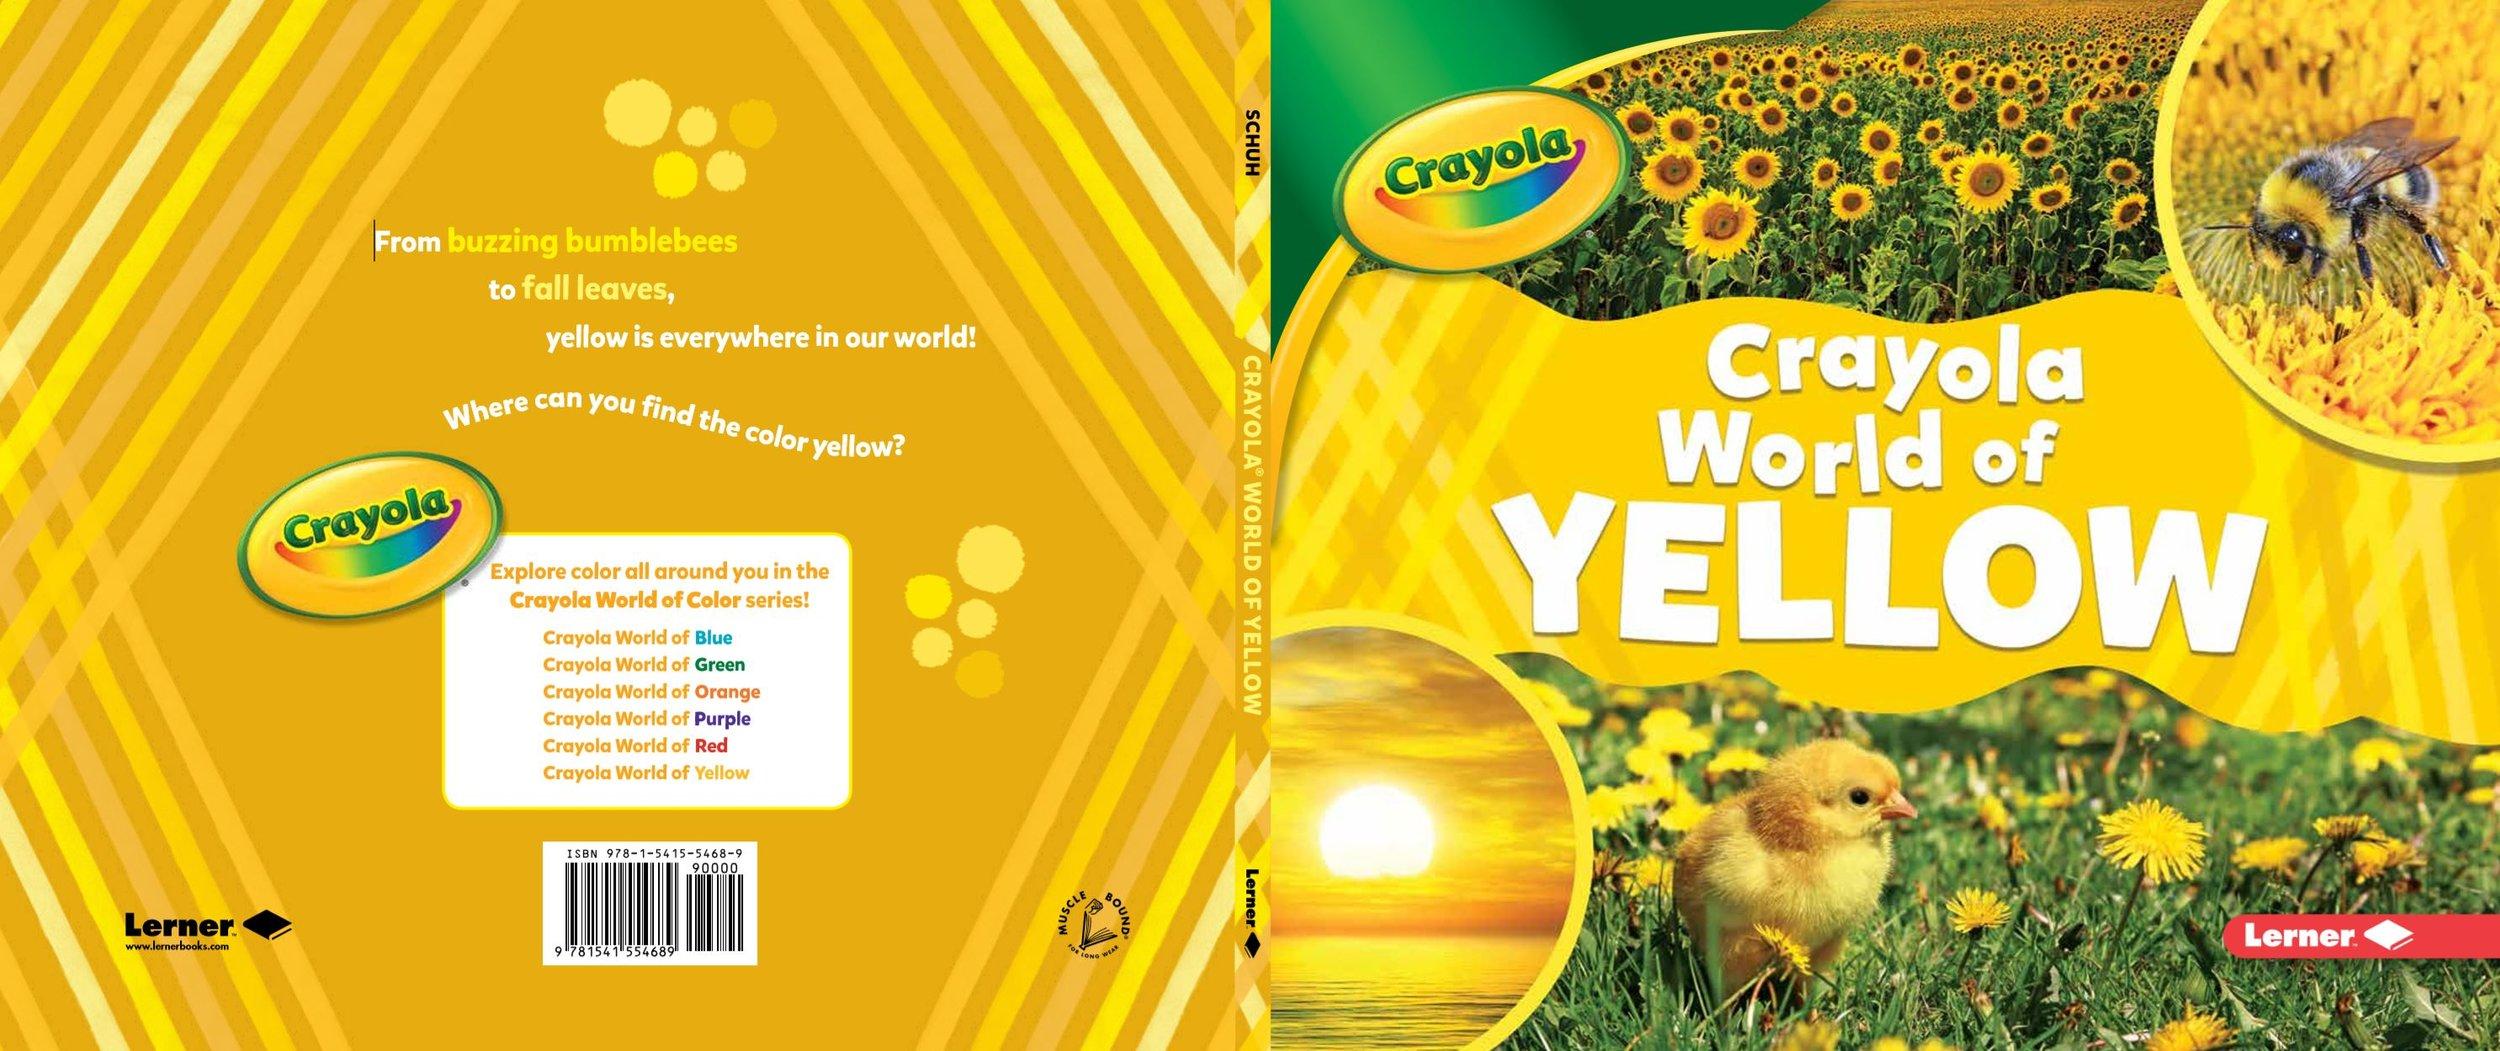 yellow cover.JPG